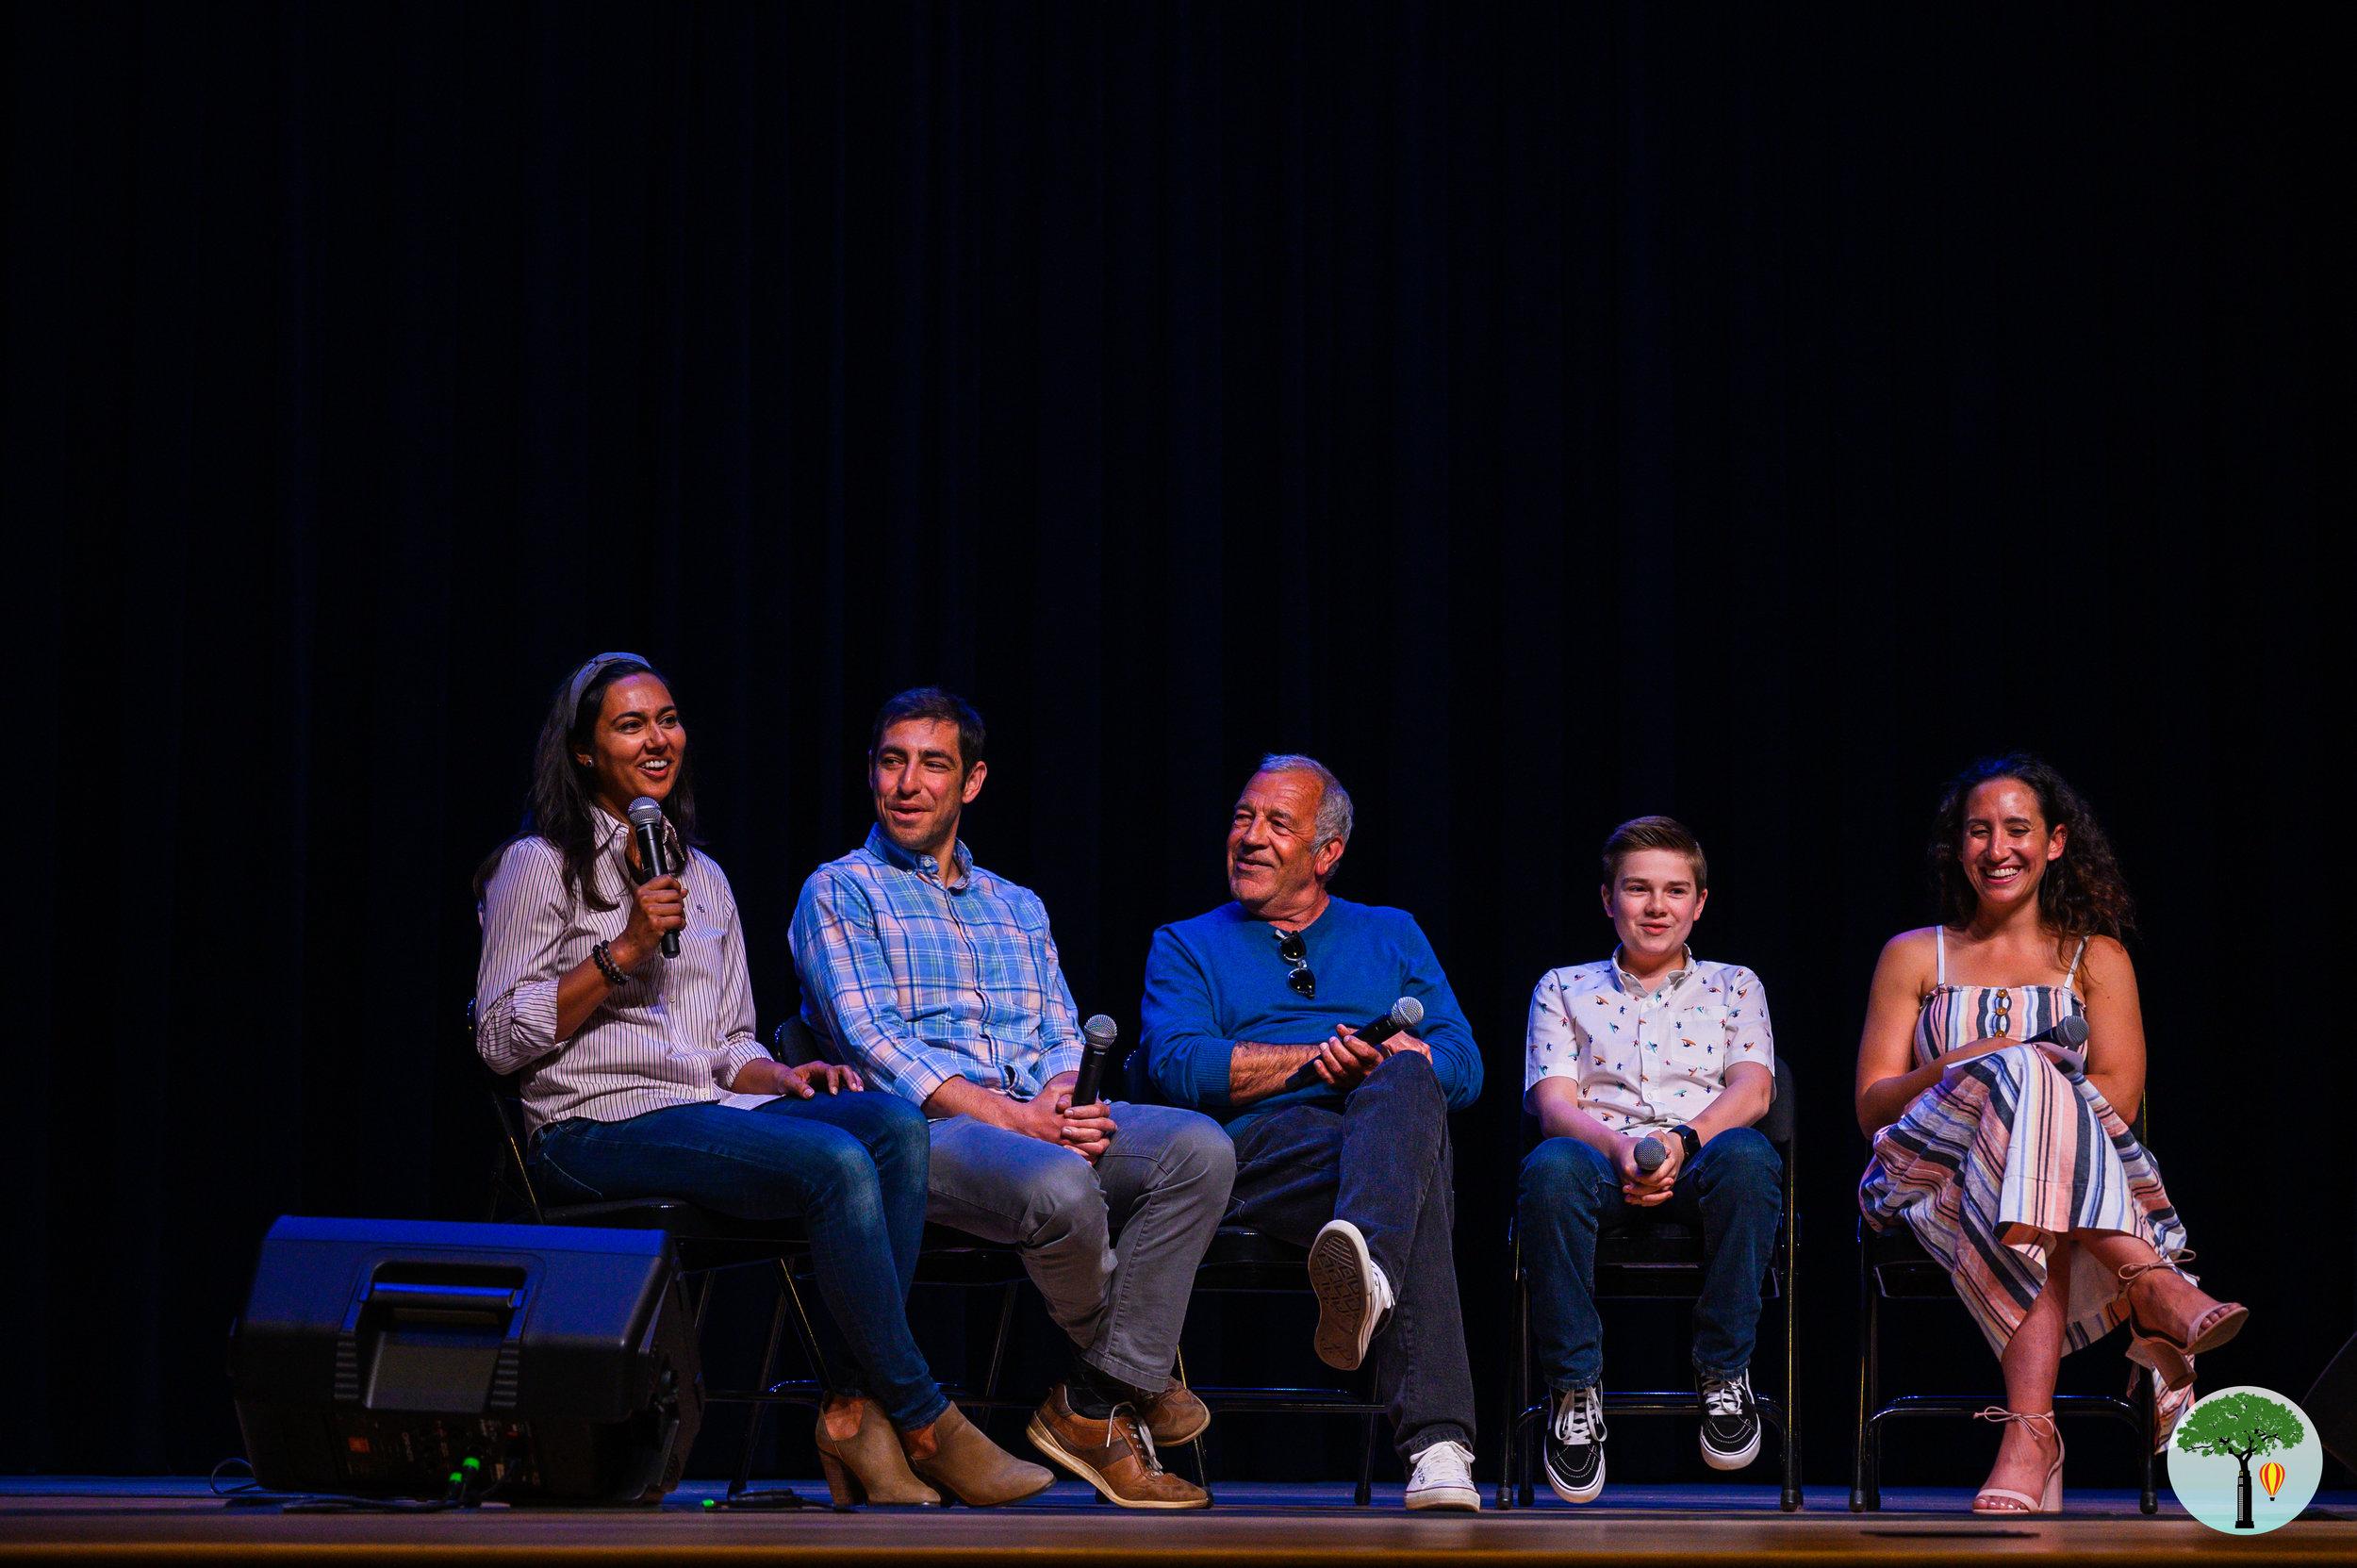 A panel discussion with Lisha Yakub Sevanian (producer), Aaron Greyson (screenwriter), Fred Gerber (director), Jet Jurgensmeyer (actor), and Alix Schwartz (moderator).